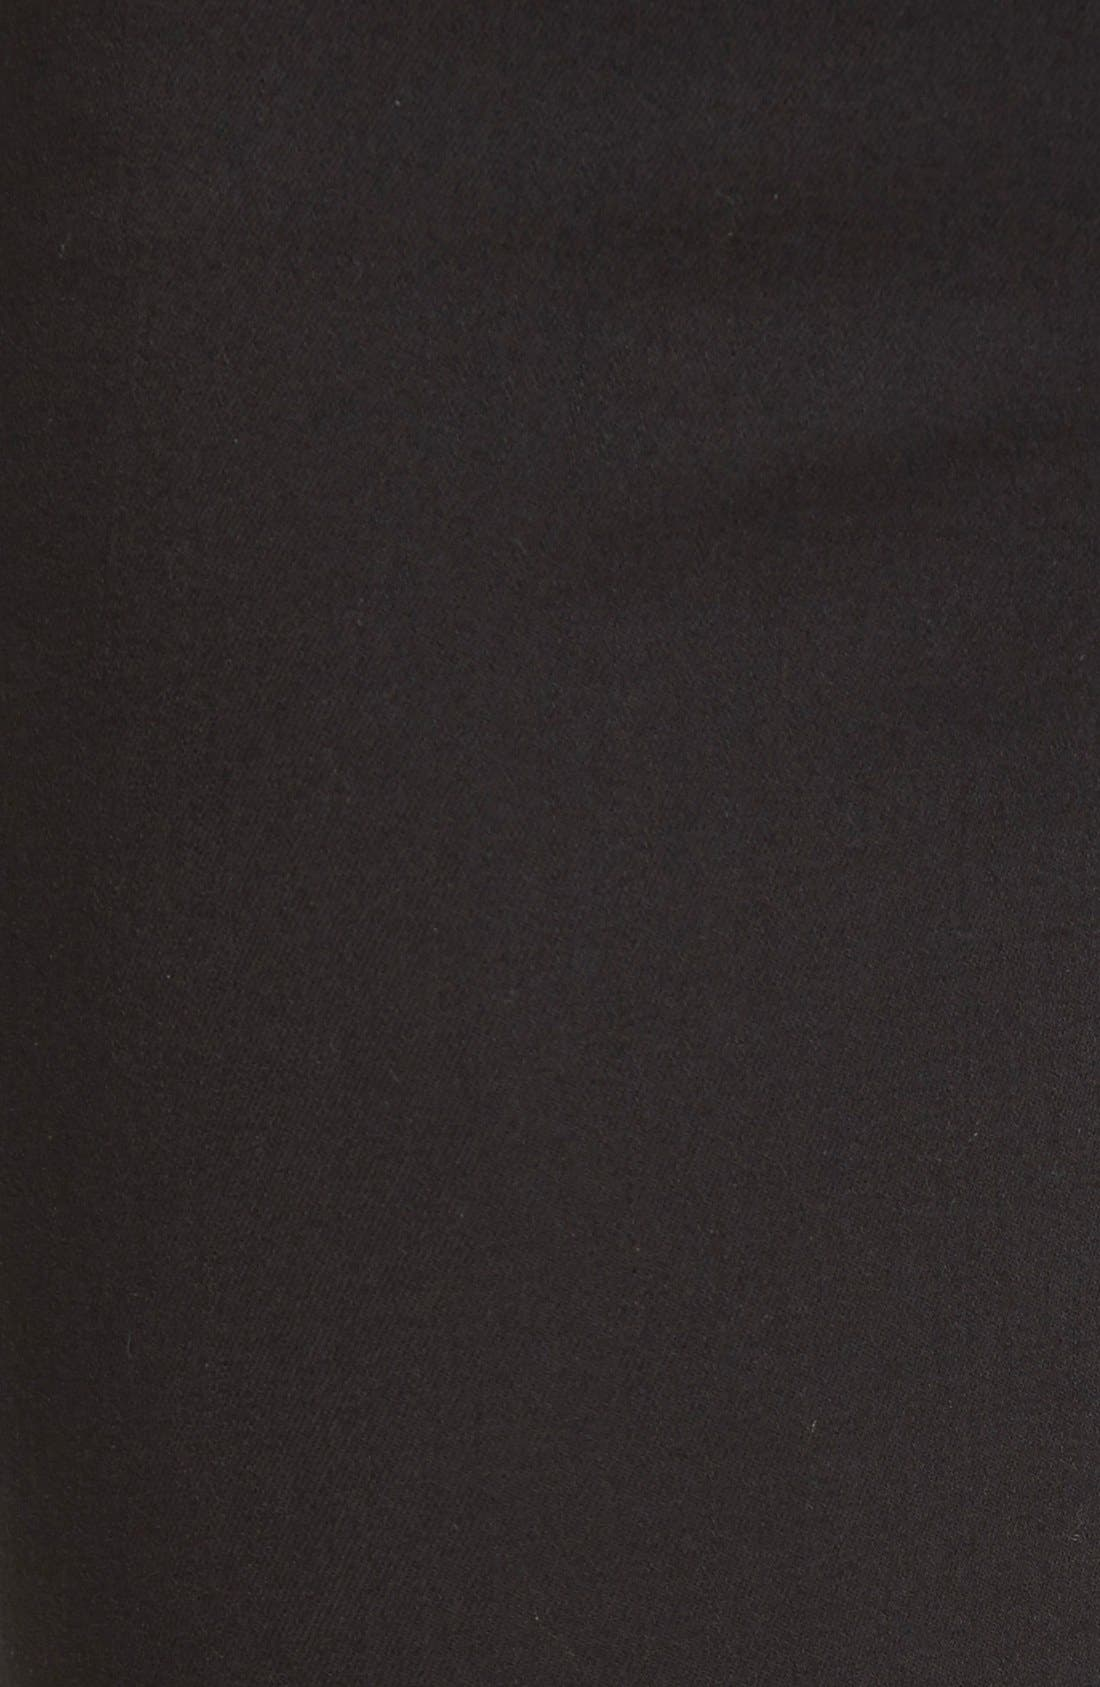 Ami Stretch Skinny Jeans,                             Alternate thumbnail 5, color,                             Black